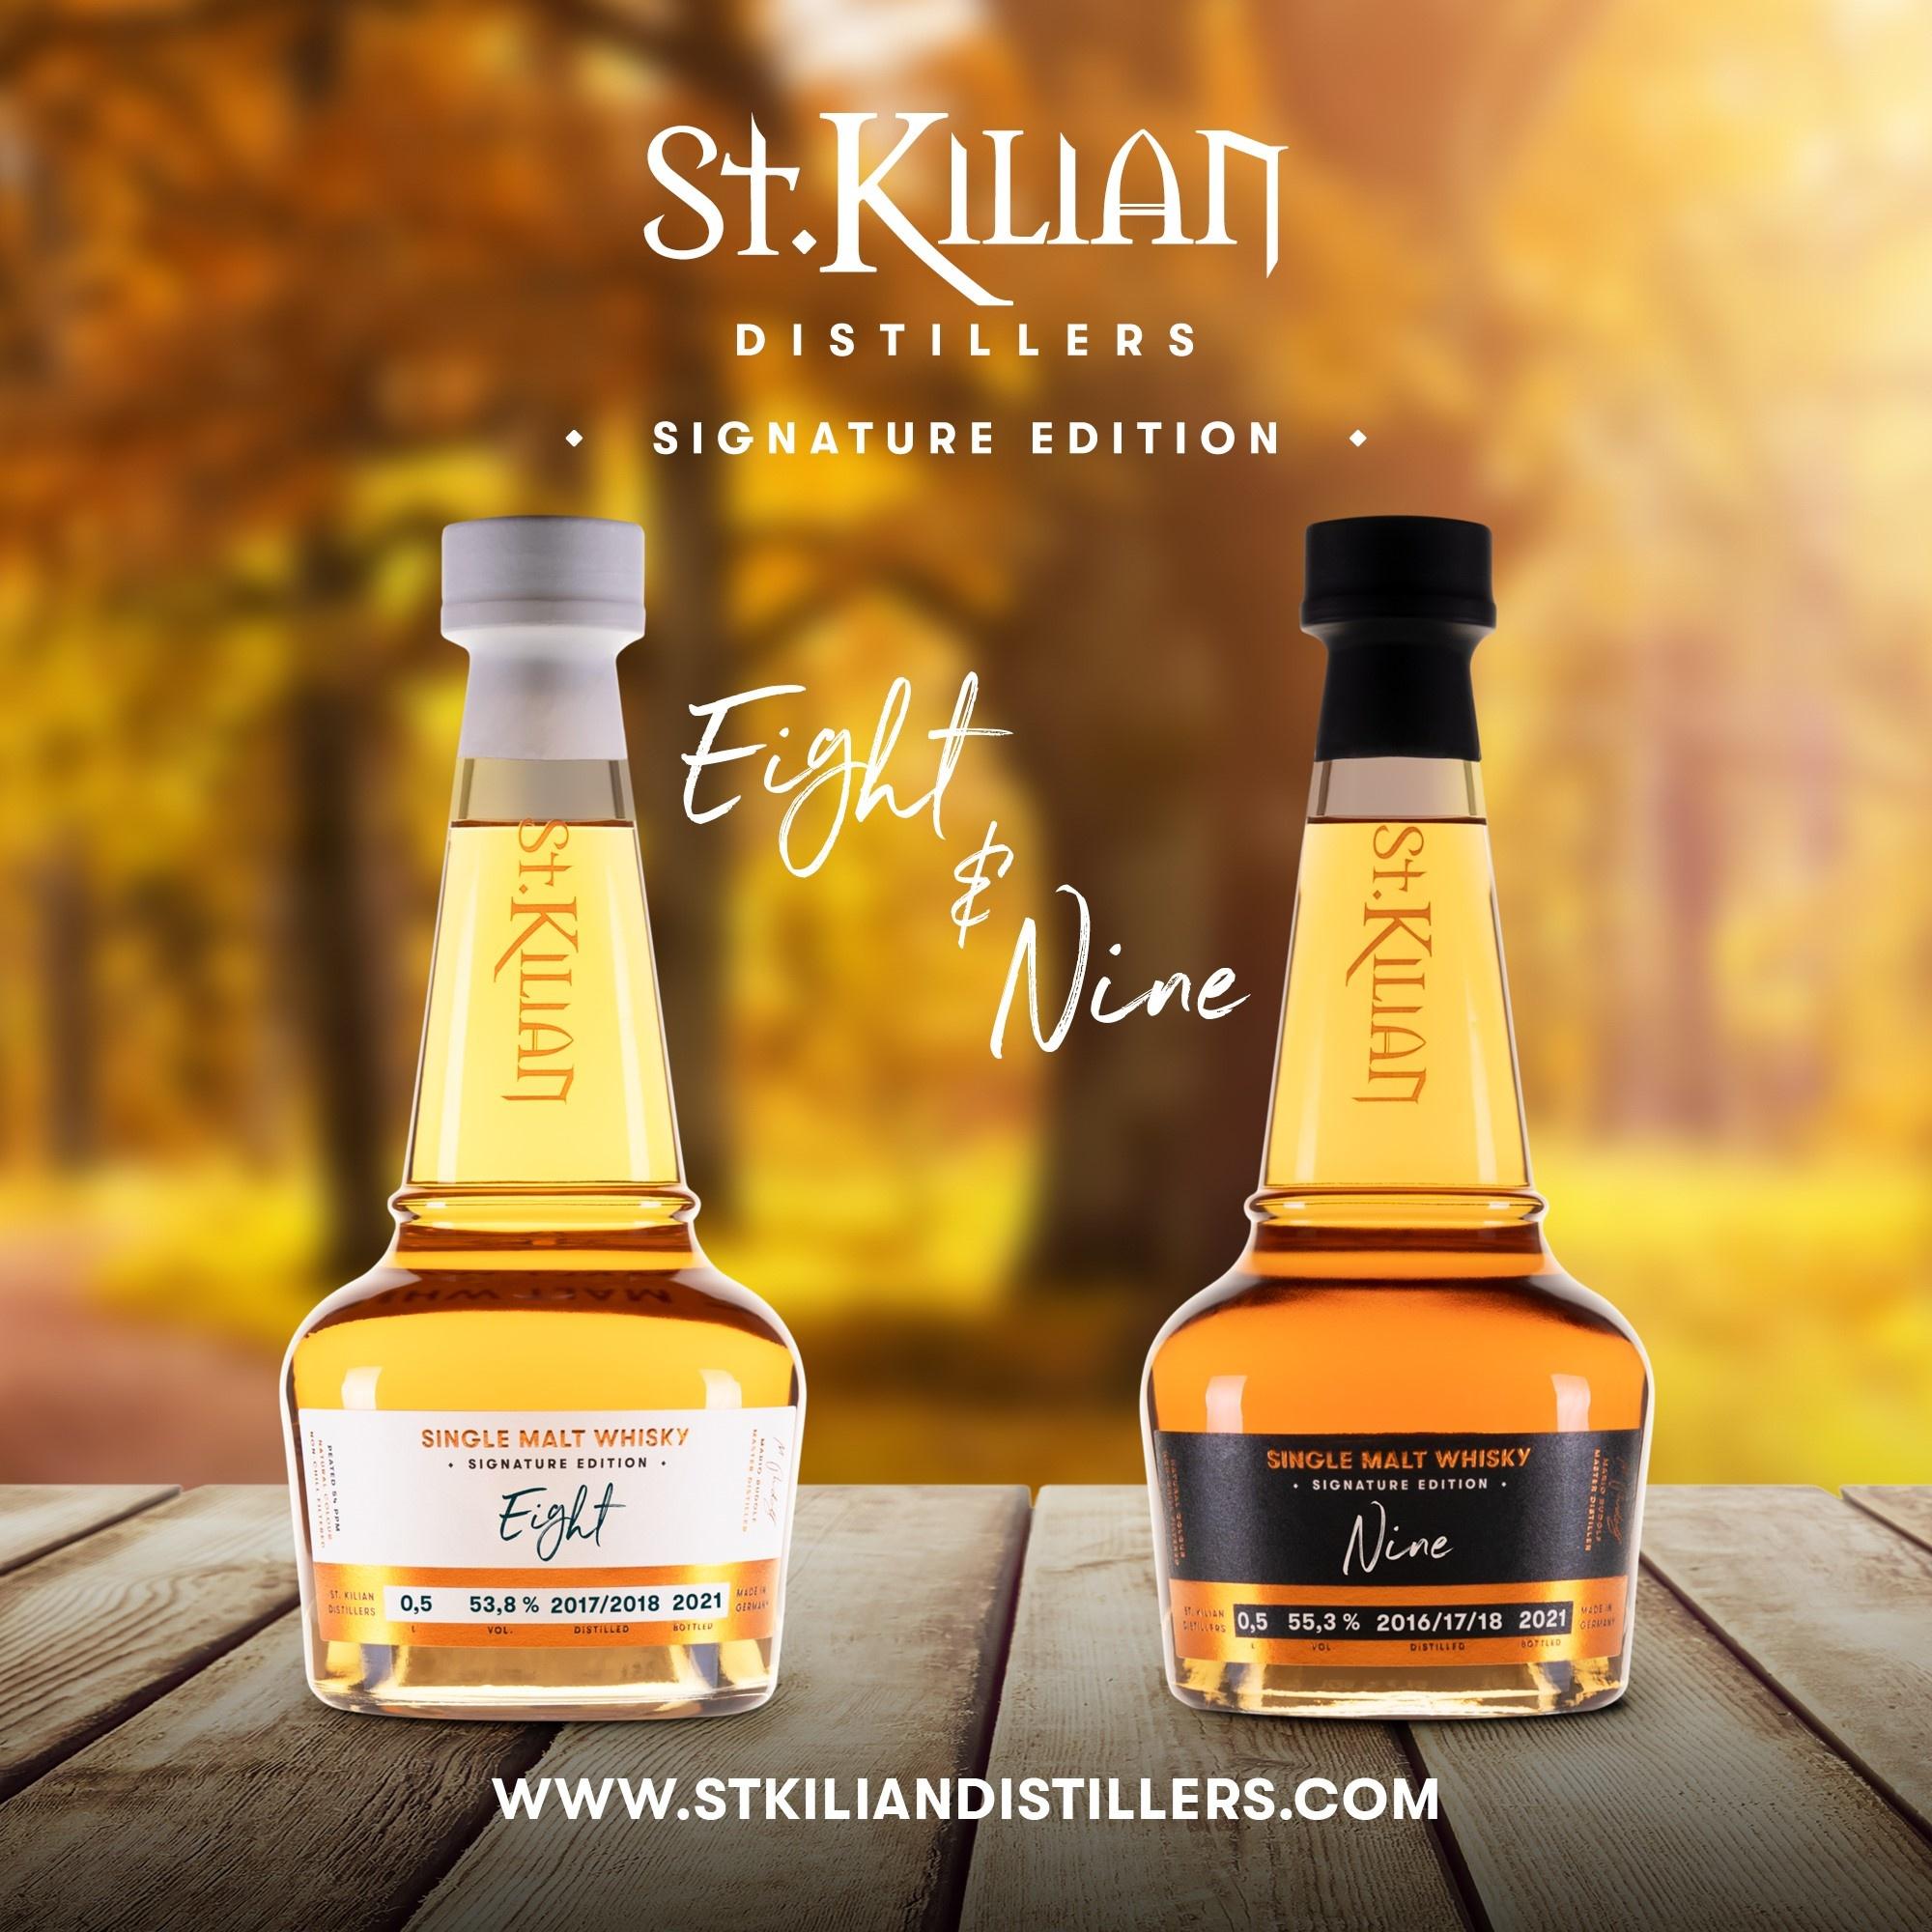 St. Kilian stellt Signature Edition Eight & Nine vor